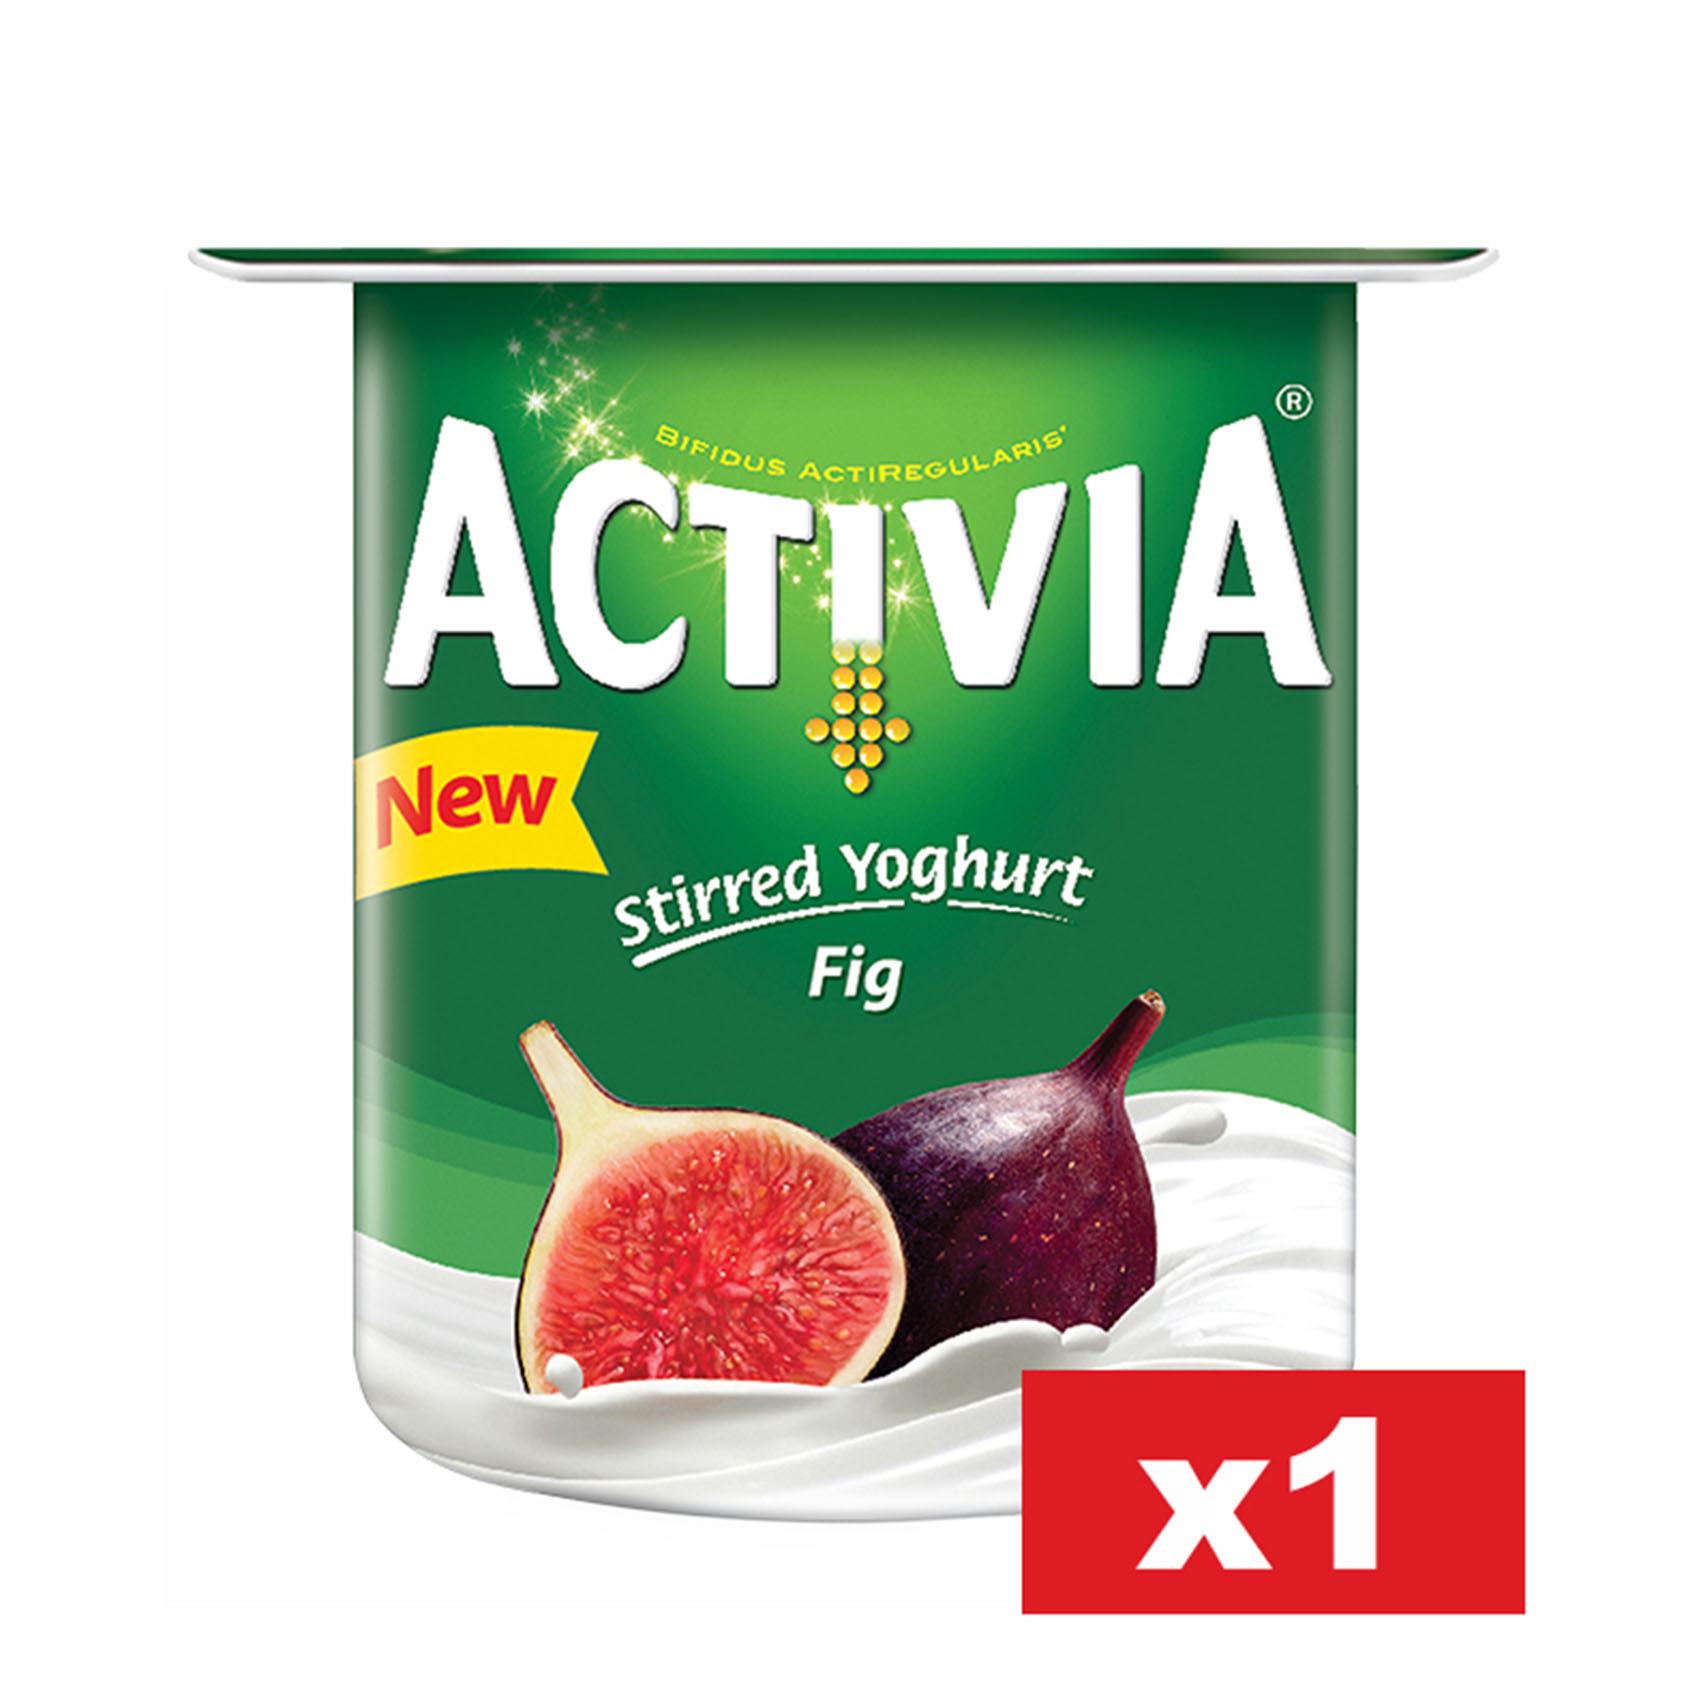 ACTIVIA FIG YOGHURT 120G